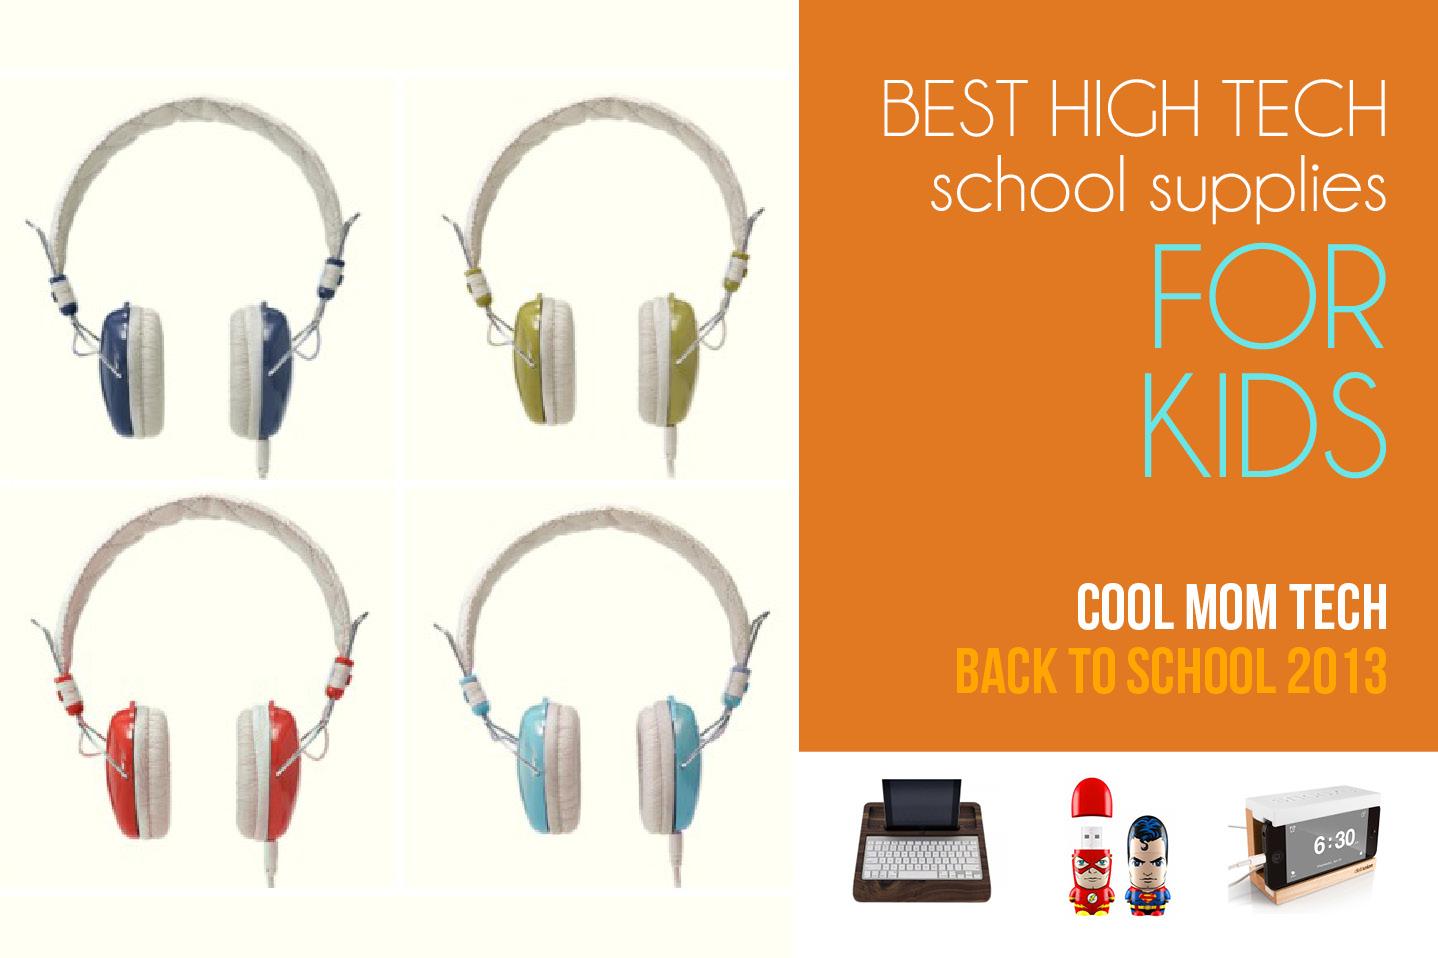 High tech school supplies: Back to School Tech Guide 2013